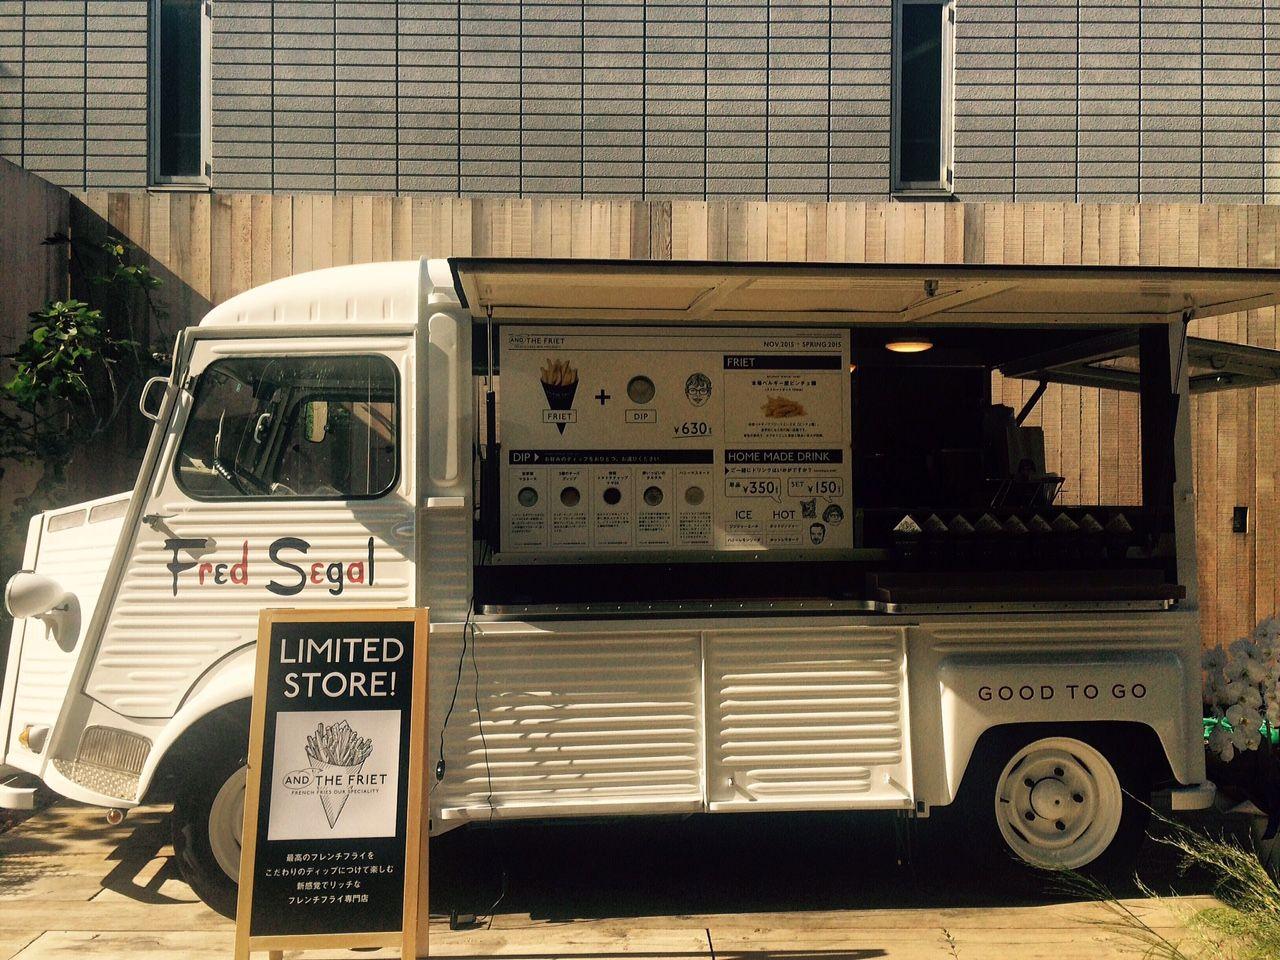 Mobile Catering Citroen H Van Food Truck